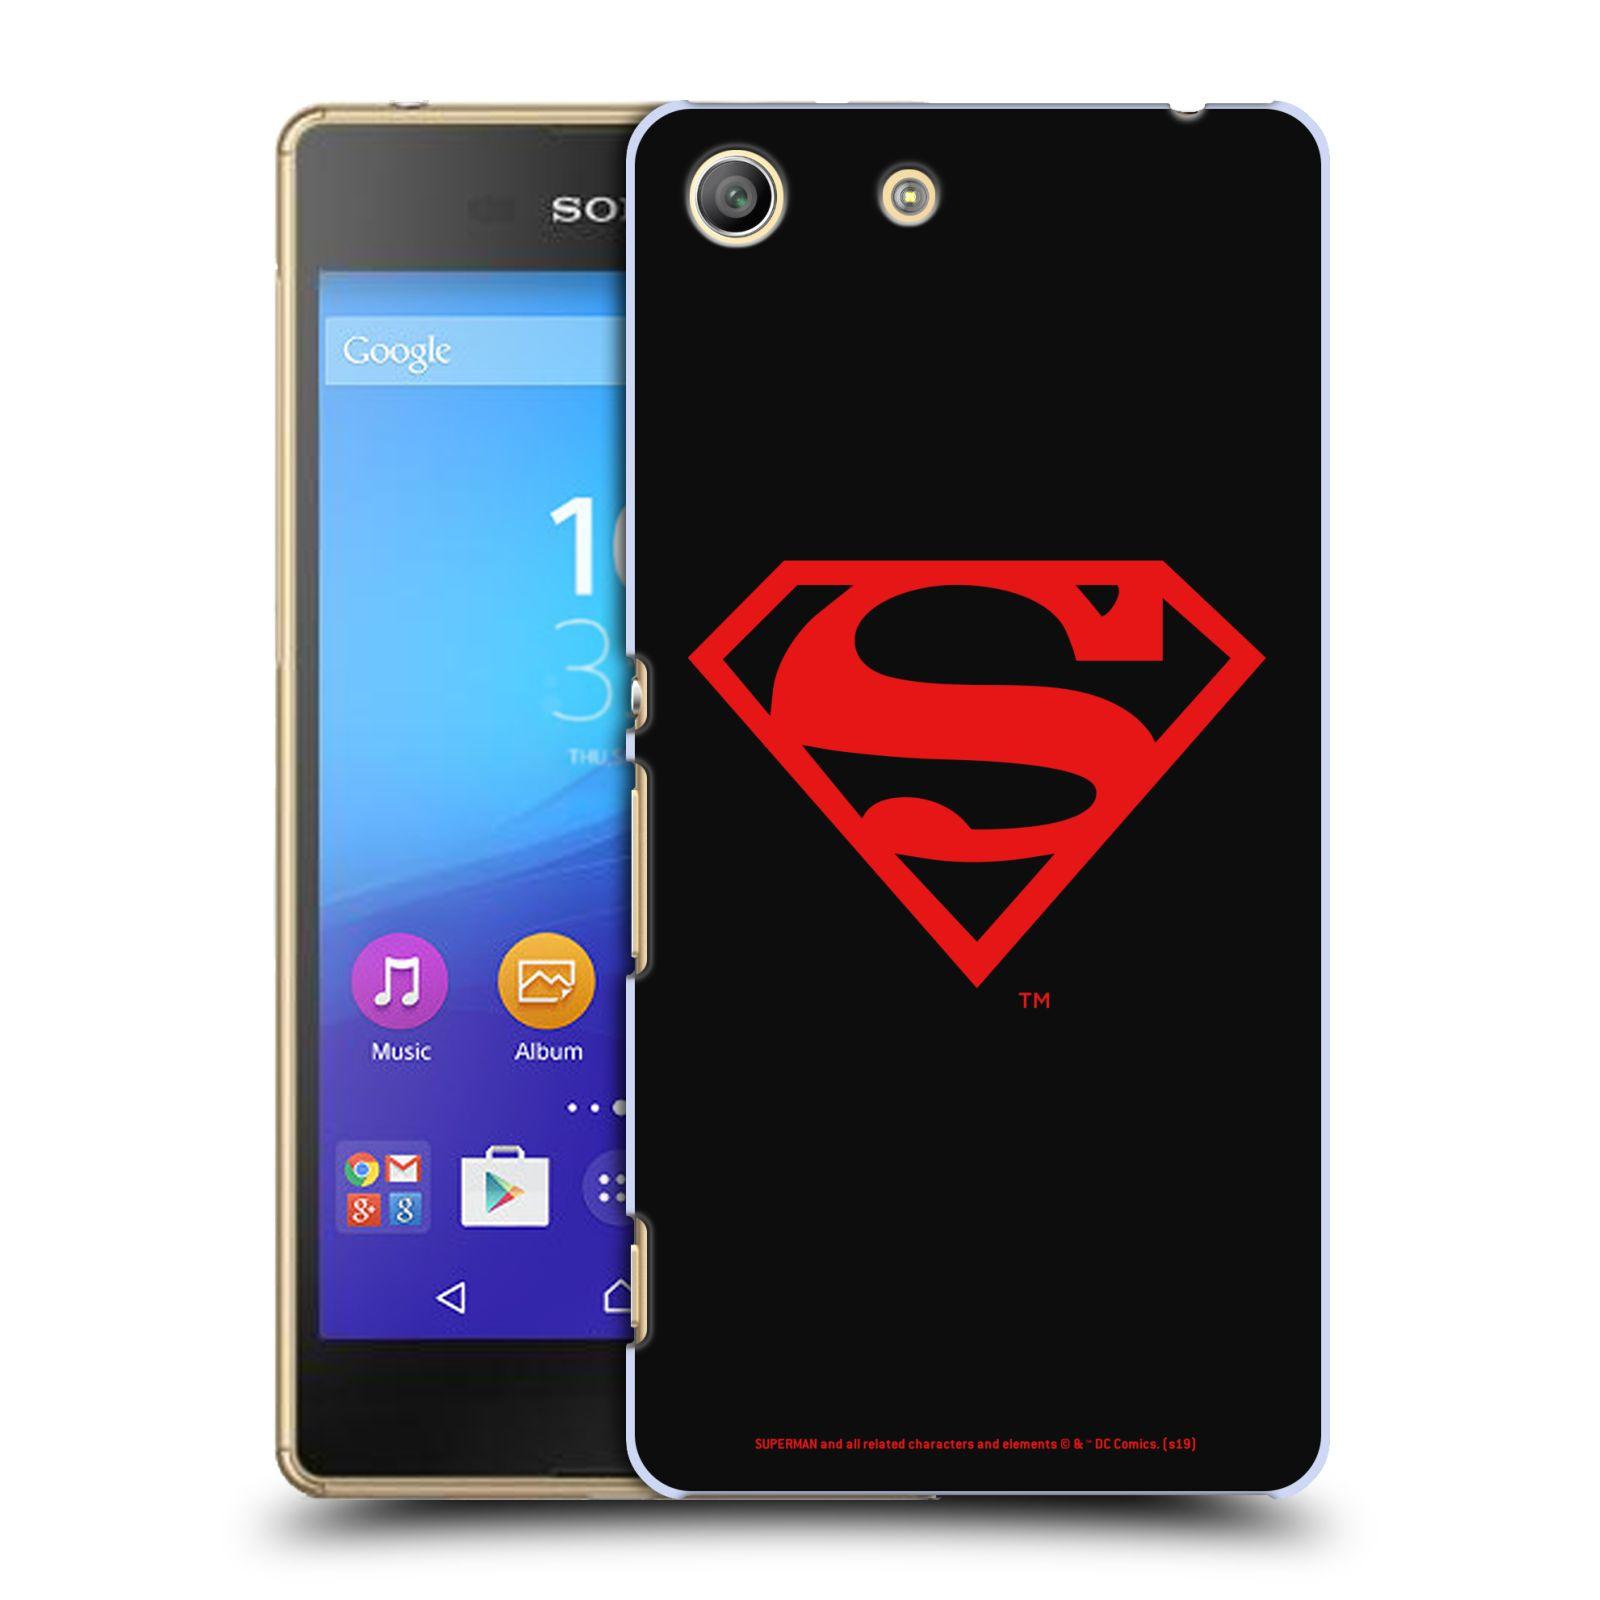 Pouzdro na mobil Sony Xperia M5 - HEAD CASE - DC komix Superman červený znak černé pozadí